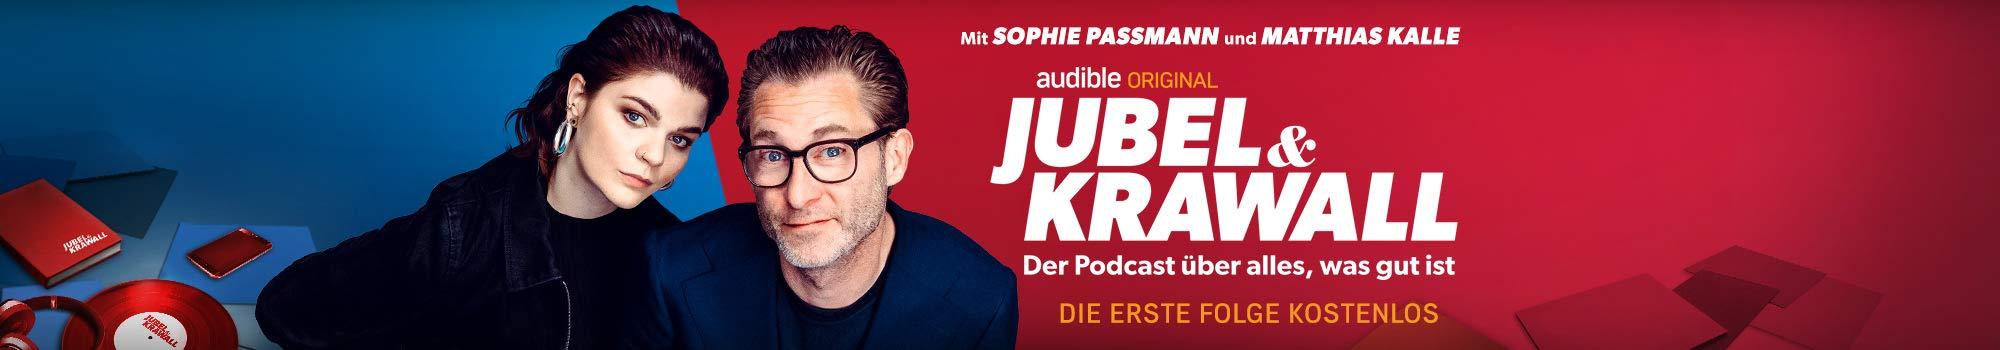 Jubel & Krawall - Audible Original Podcast mit Sophie Passmann und Matthias Kalle